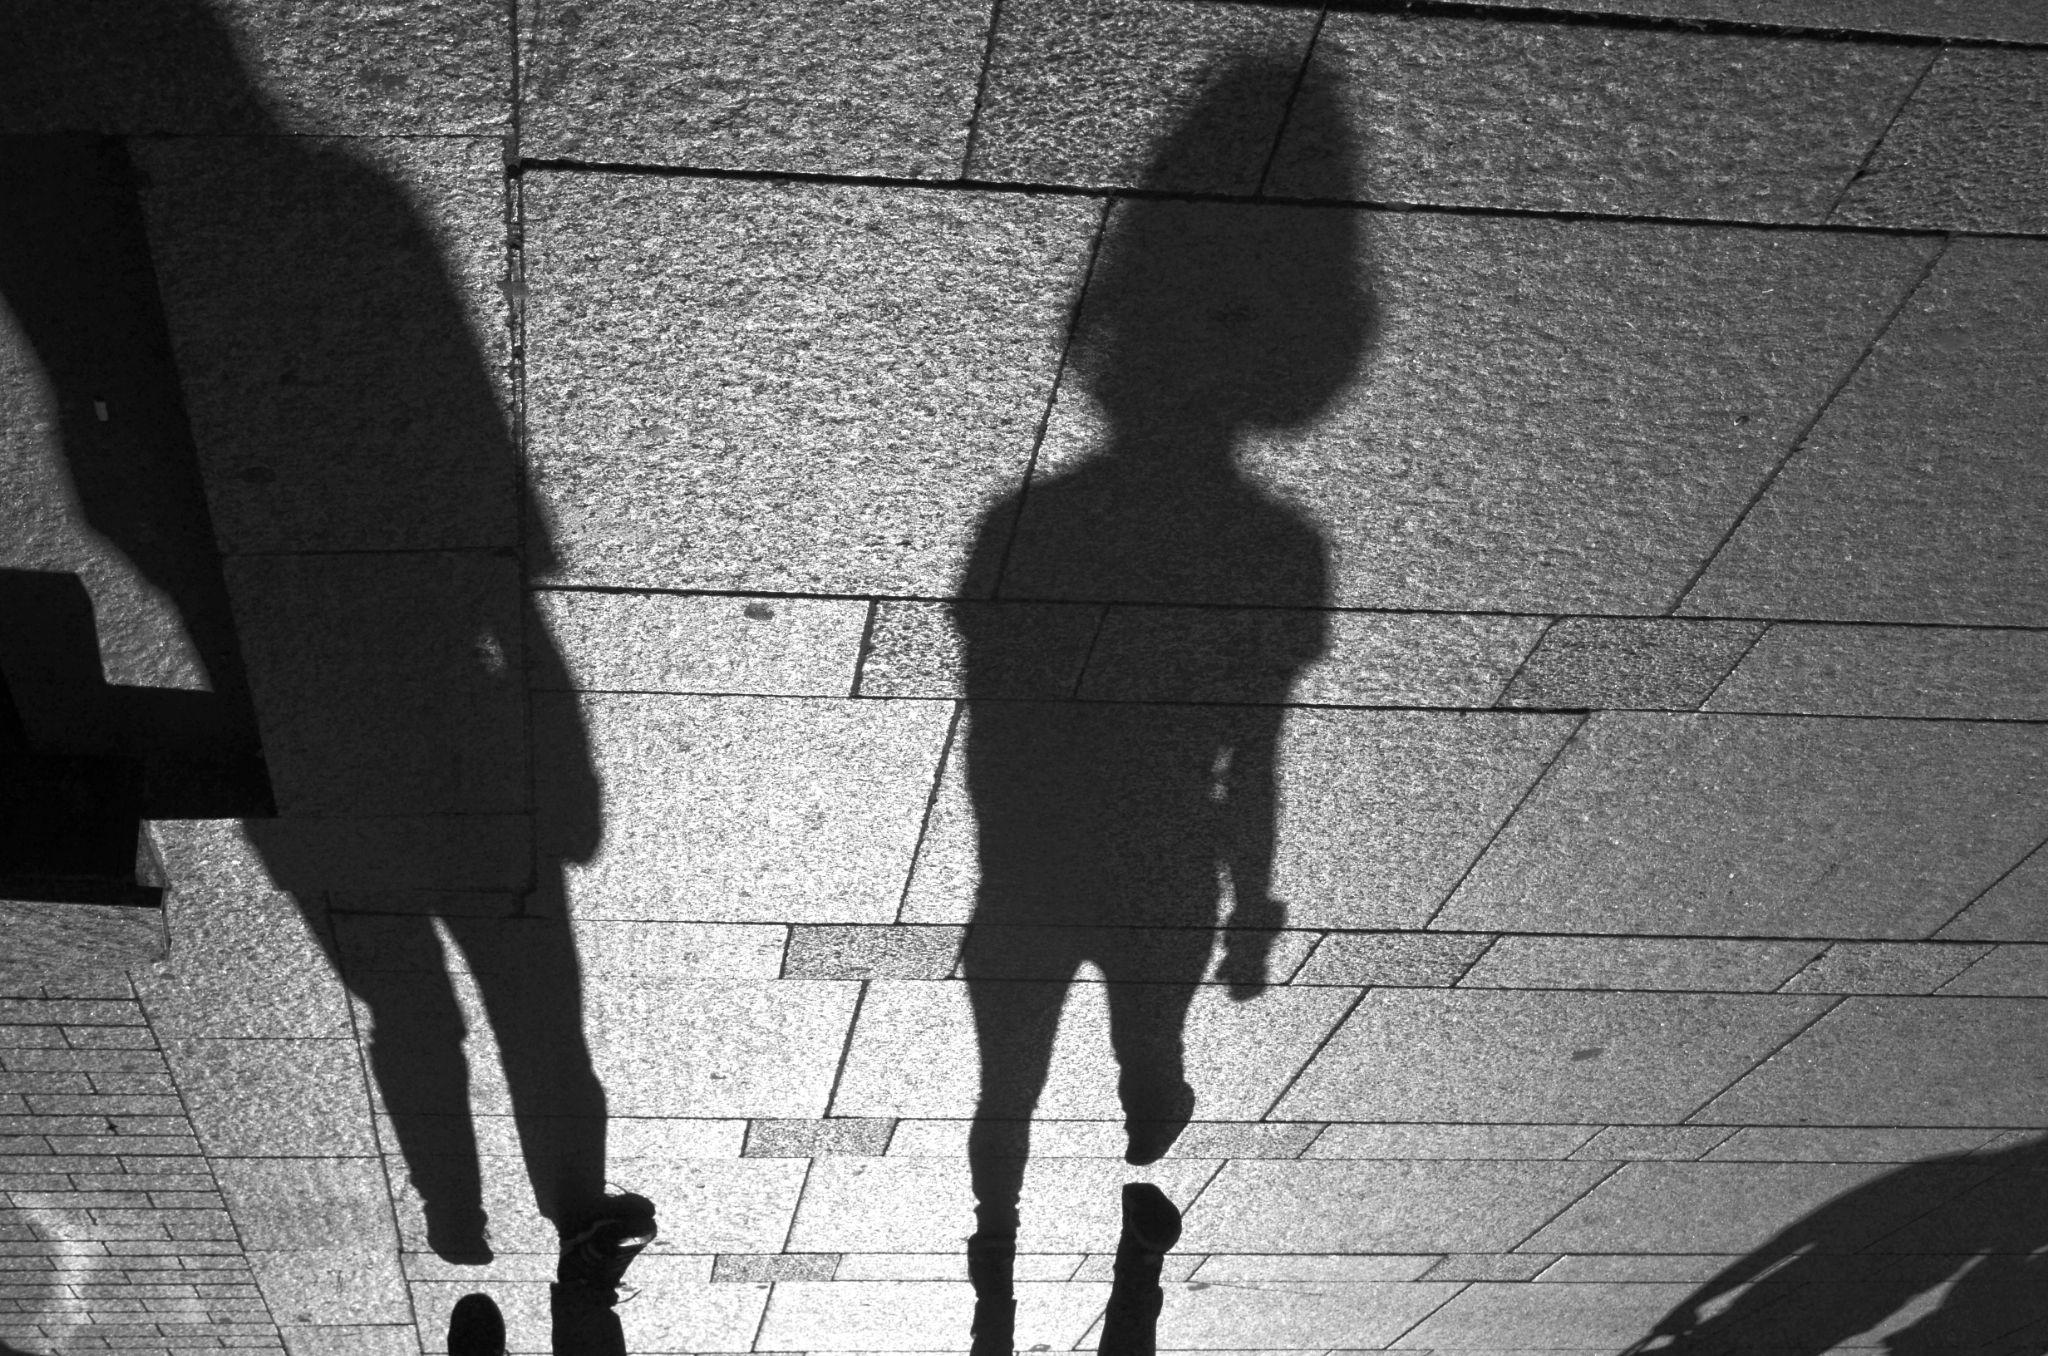 Shadows by Anneta Marchenko